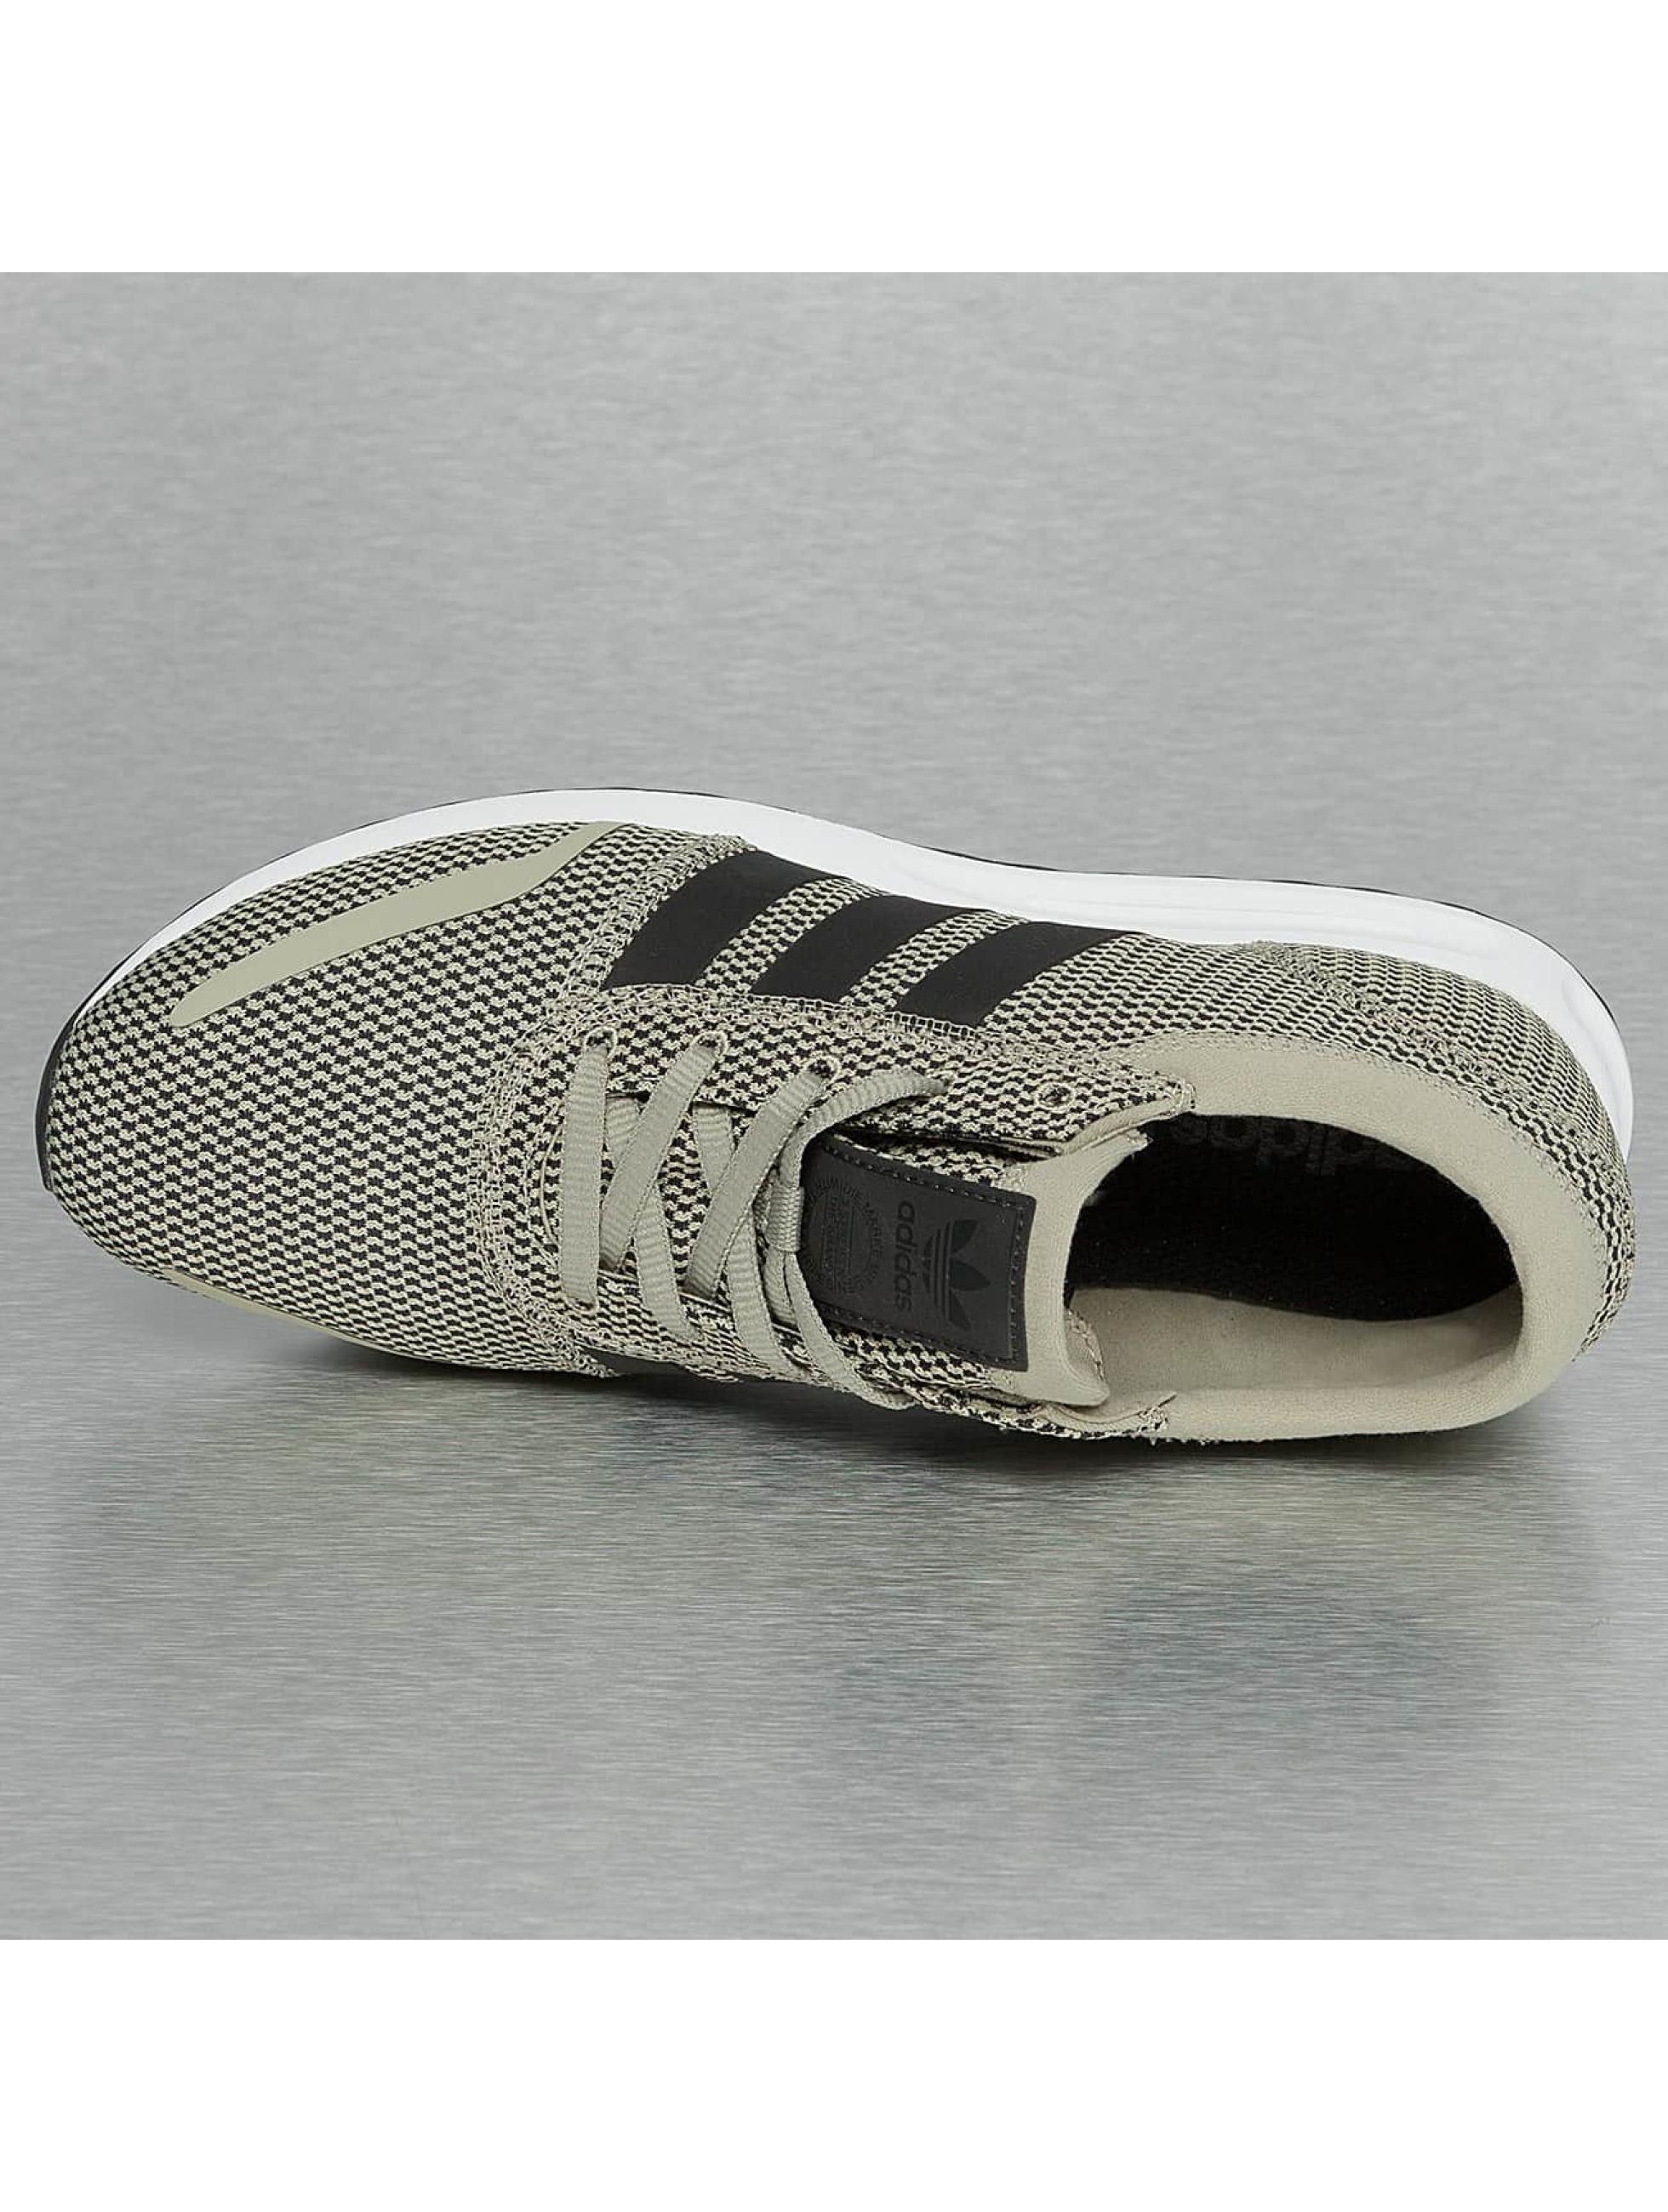 adidas sneaker los angeles in beige 302813. Black Bedroom Furniture Sets. Home Design Ideas